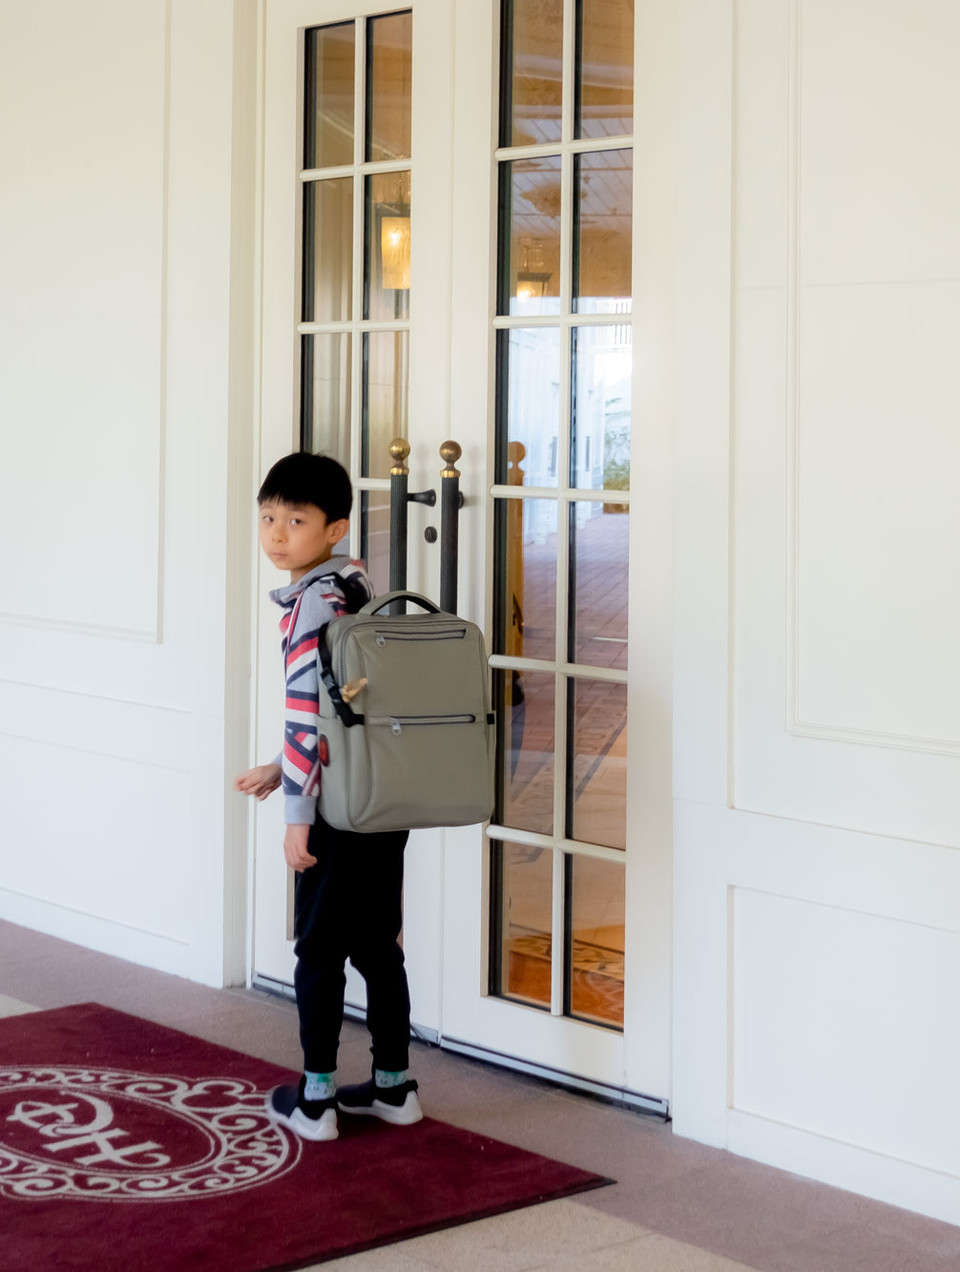 mvb stress reduction backpack for kids.jpg